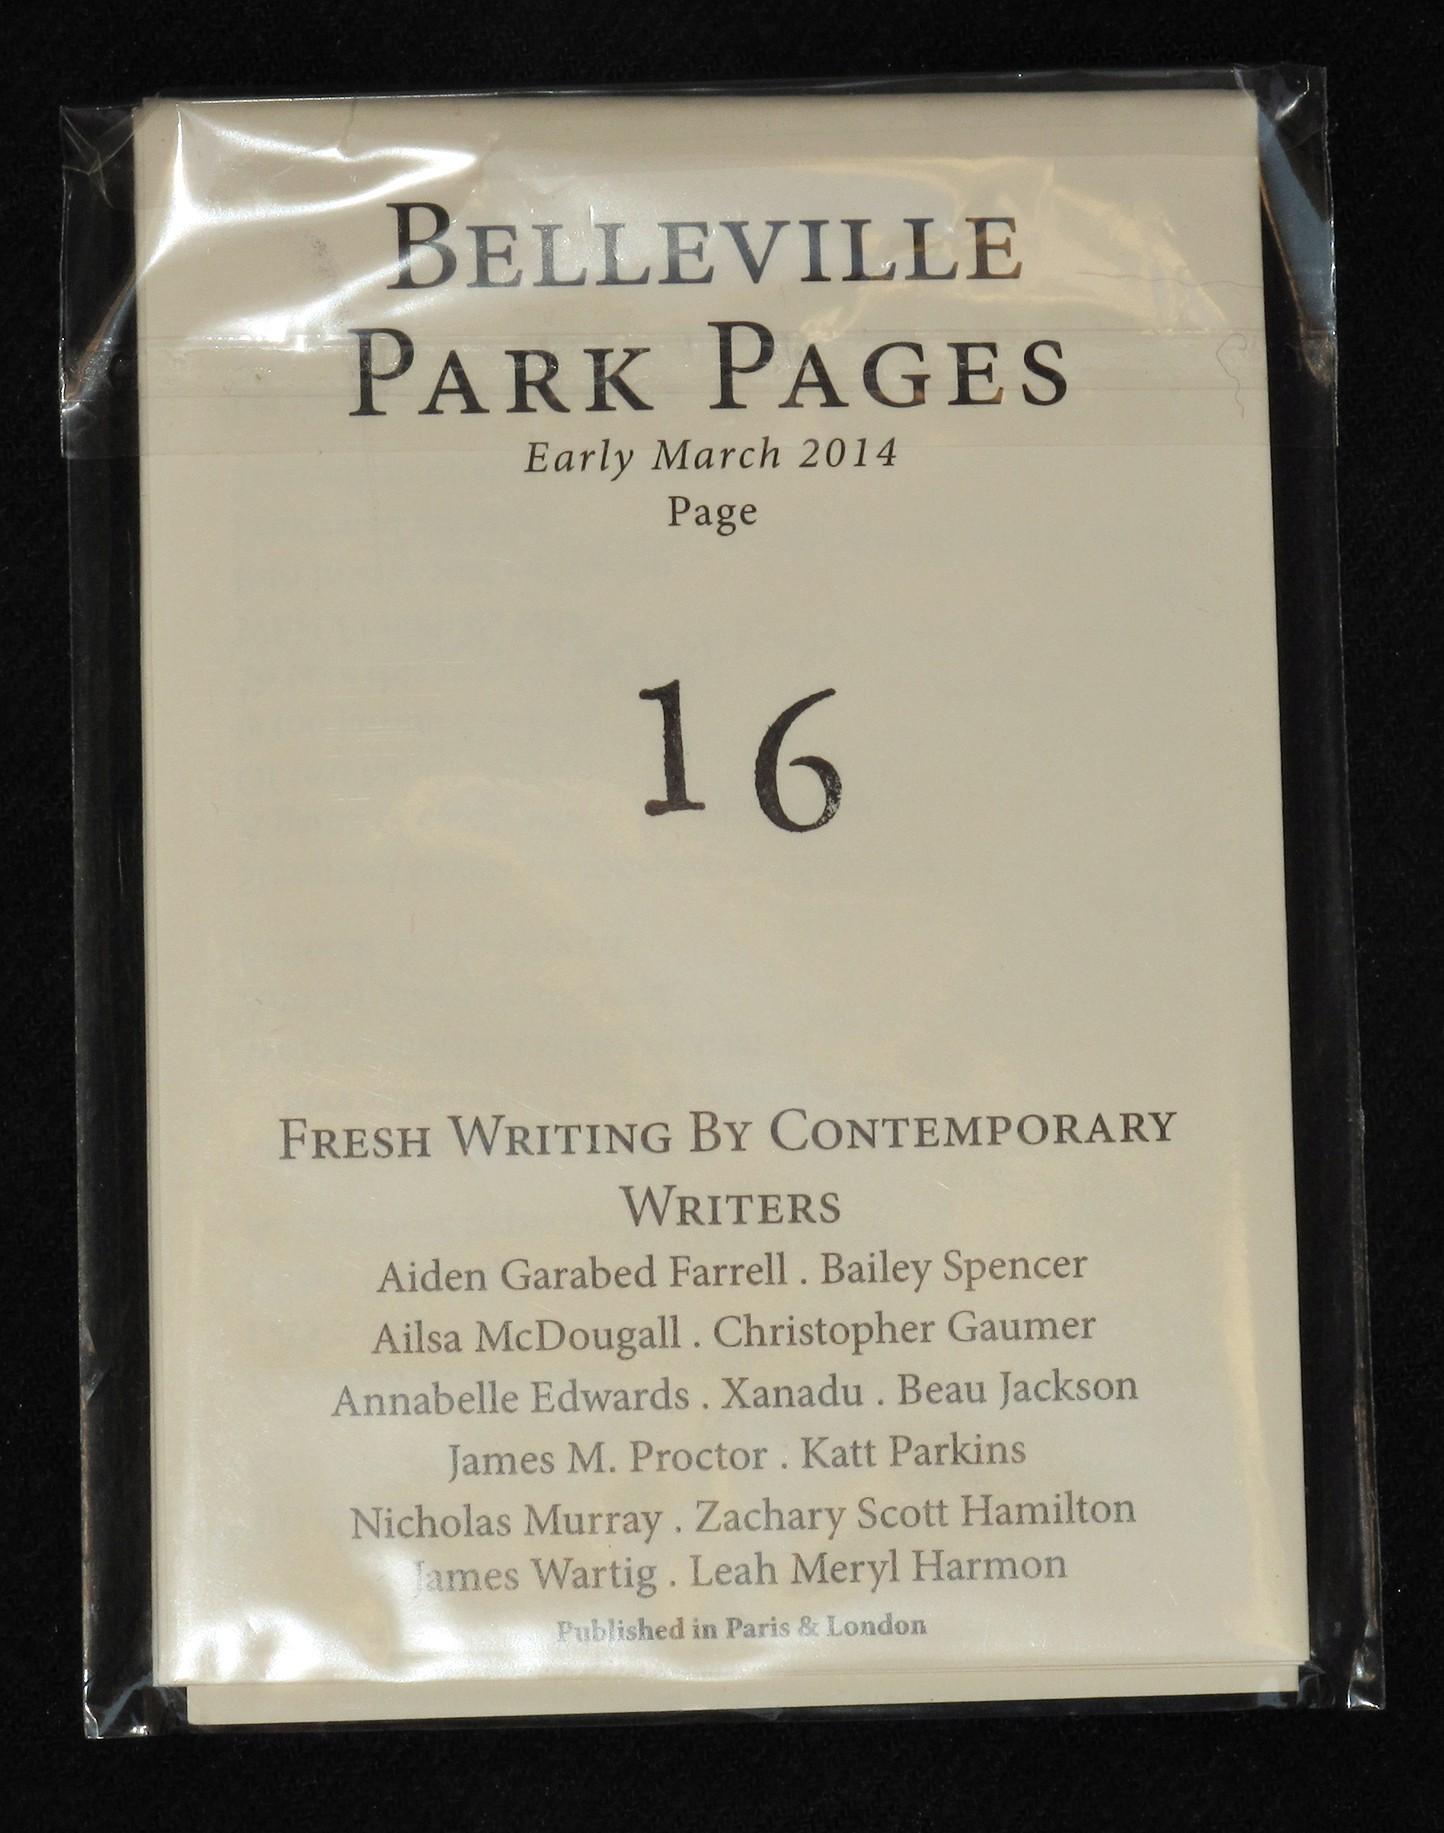 Belleville Pages Belleville Park Pages 16